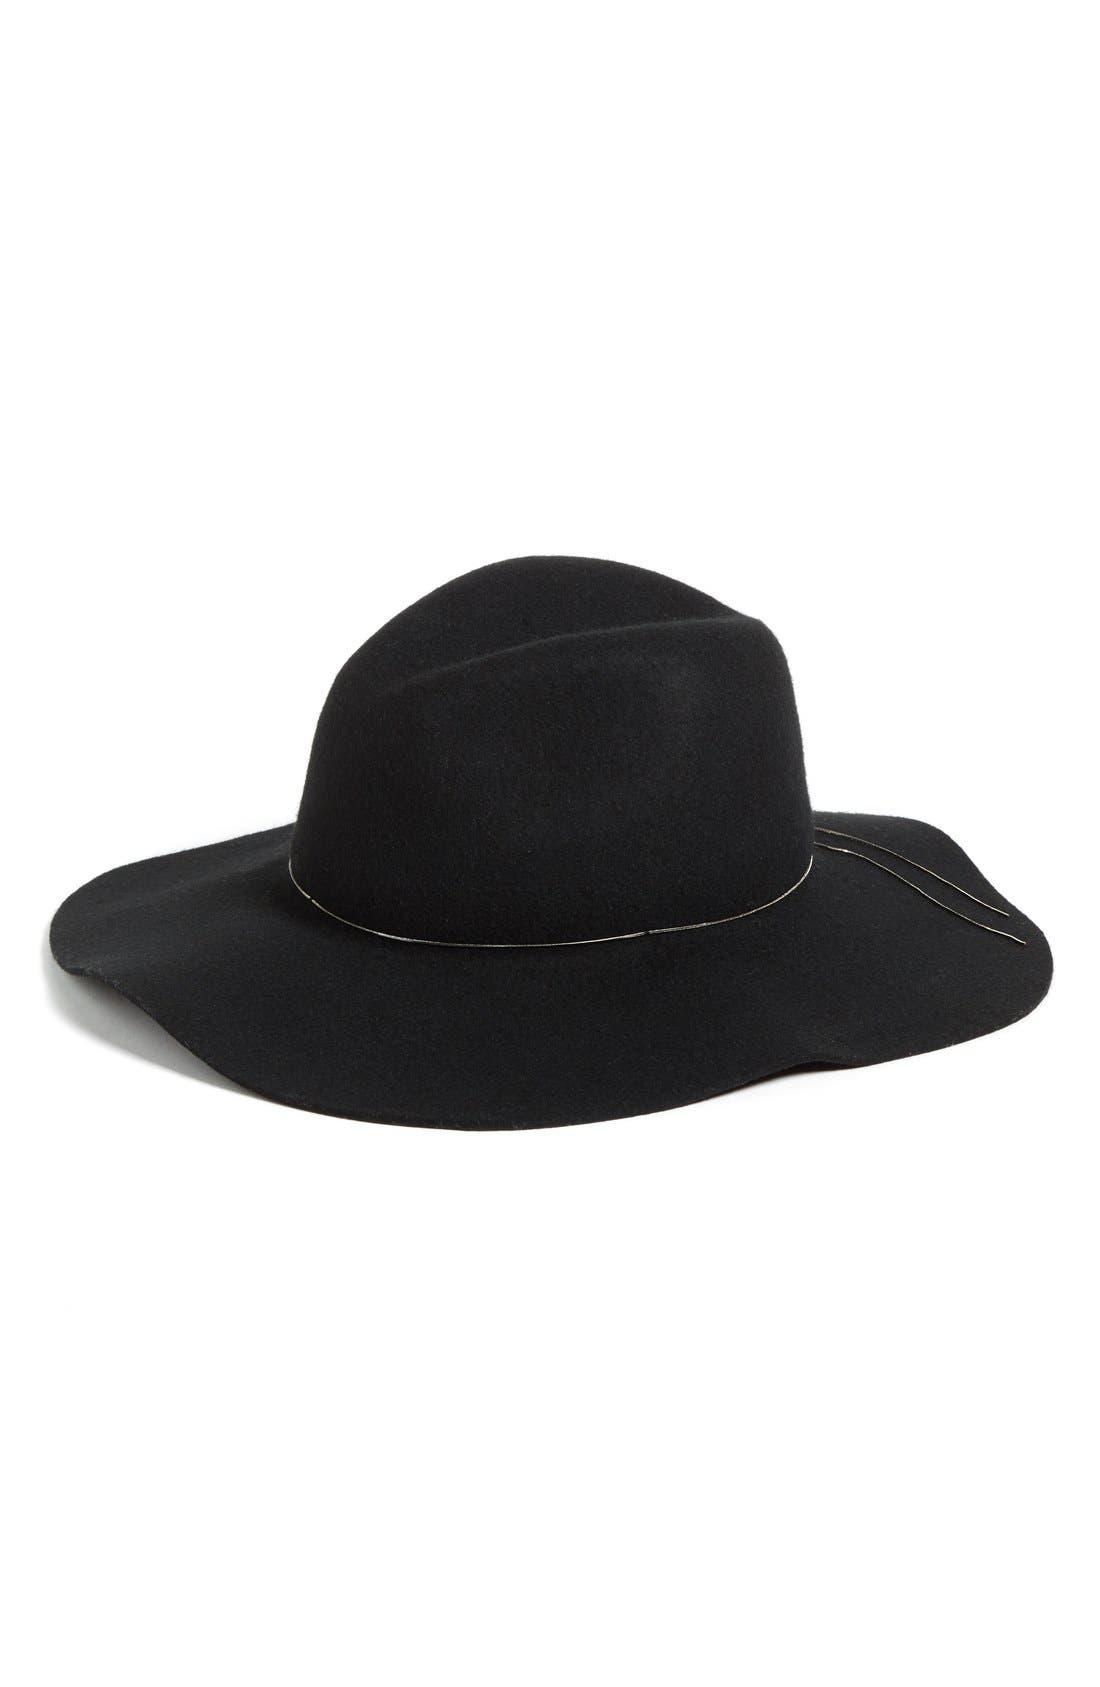 HINGE, Floppy Wool Felt Hat, Main thumbnail 1, color, 001